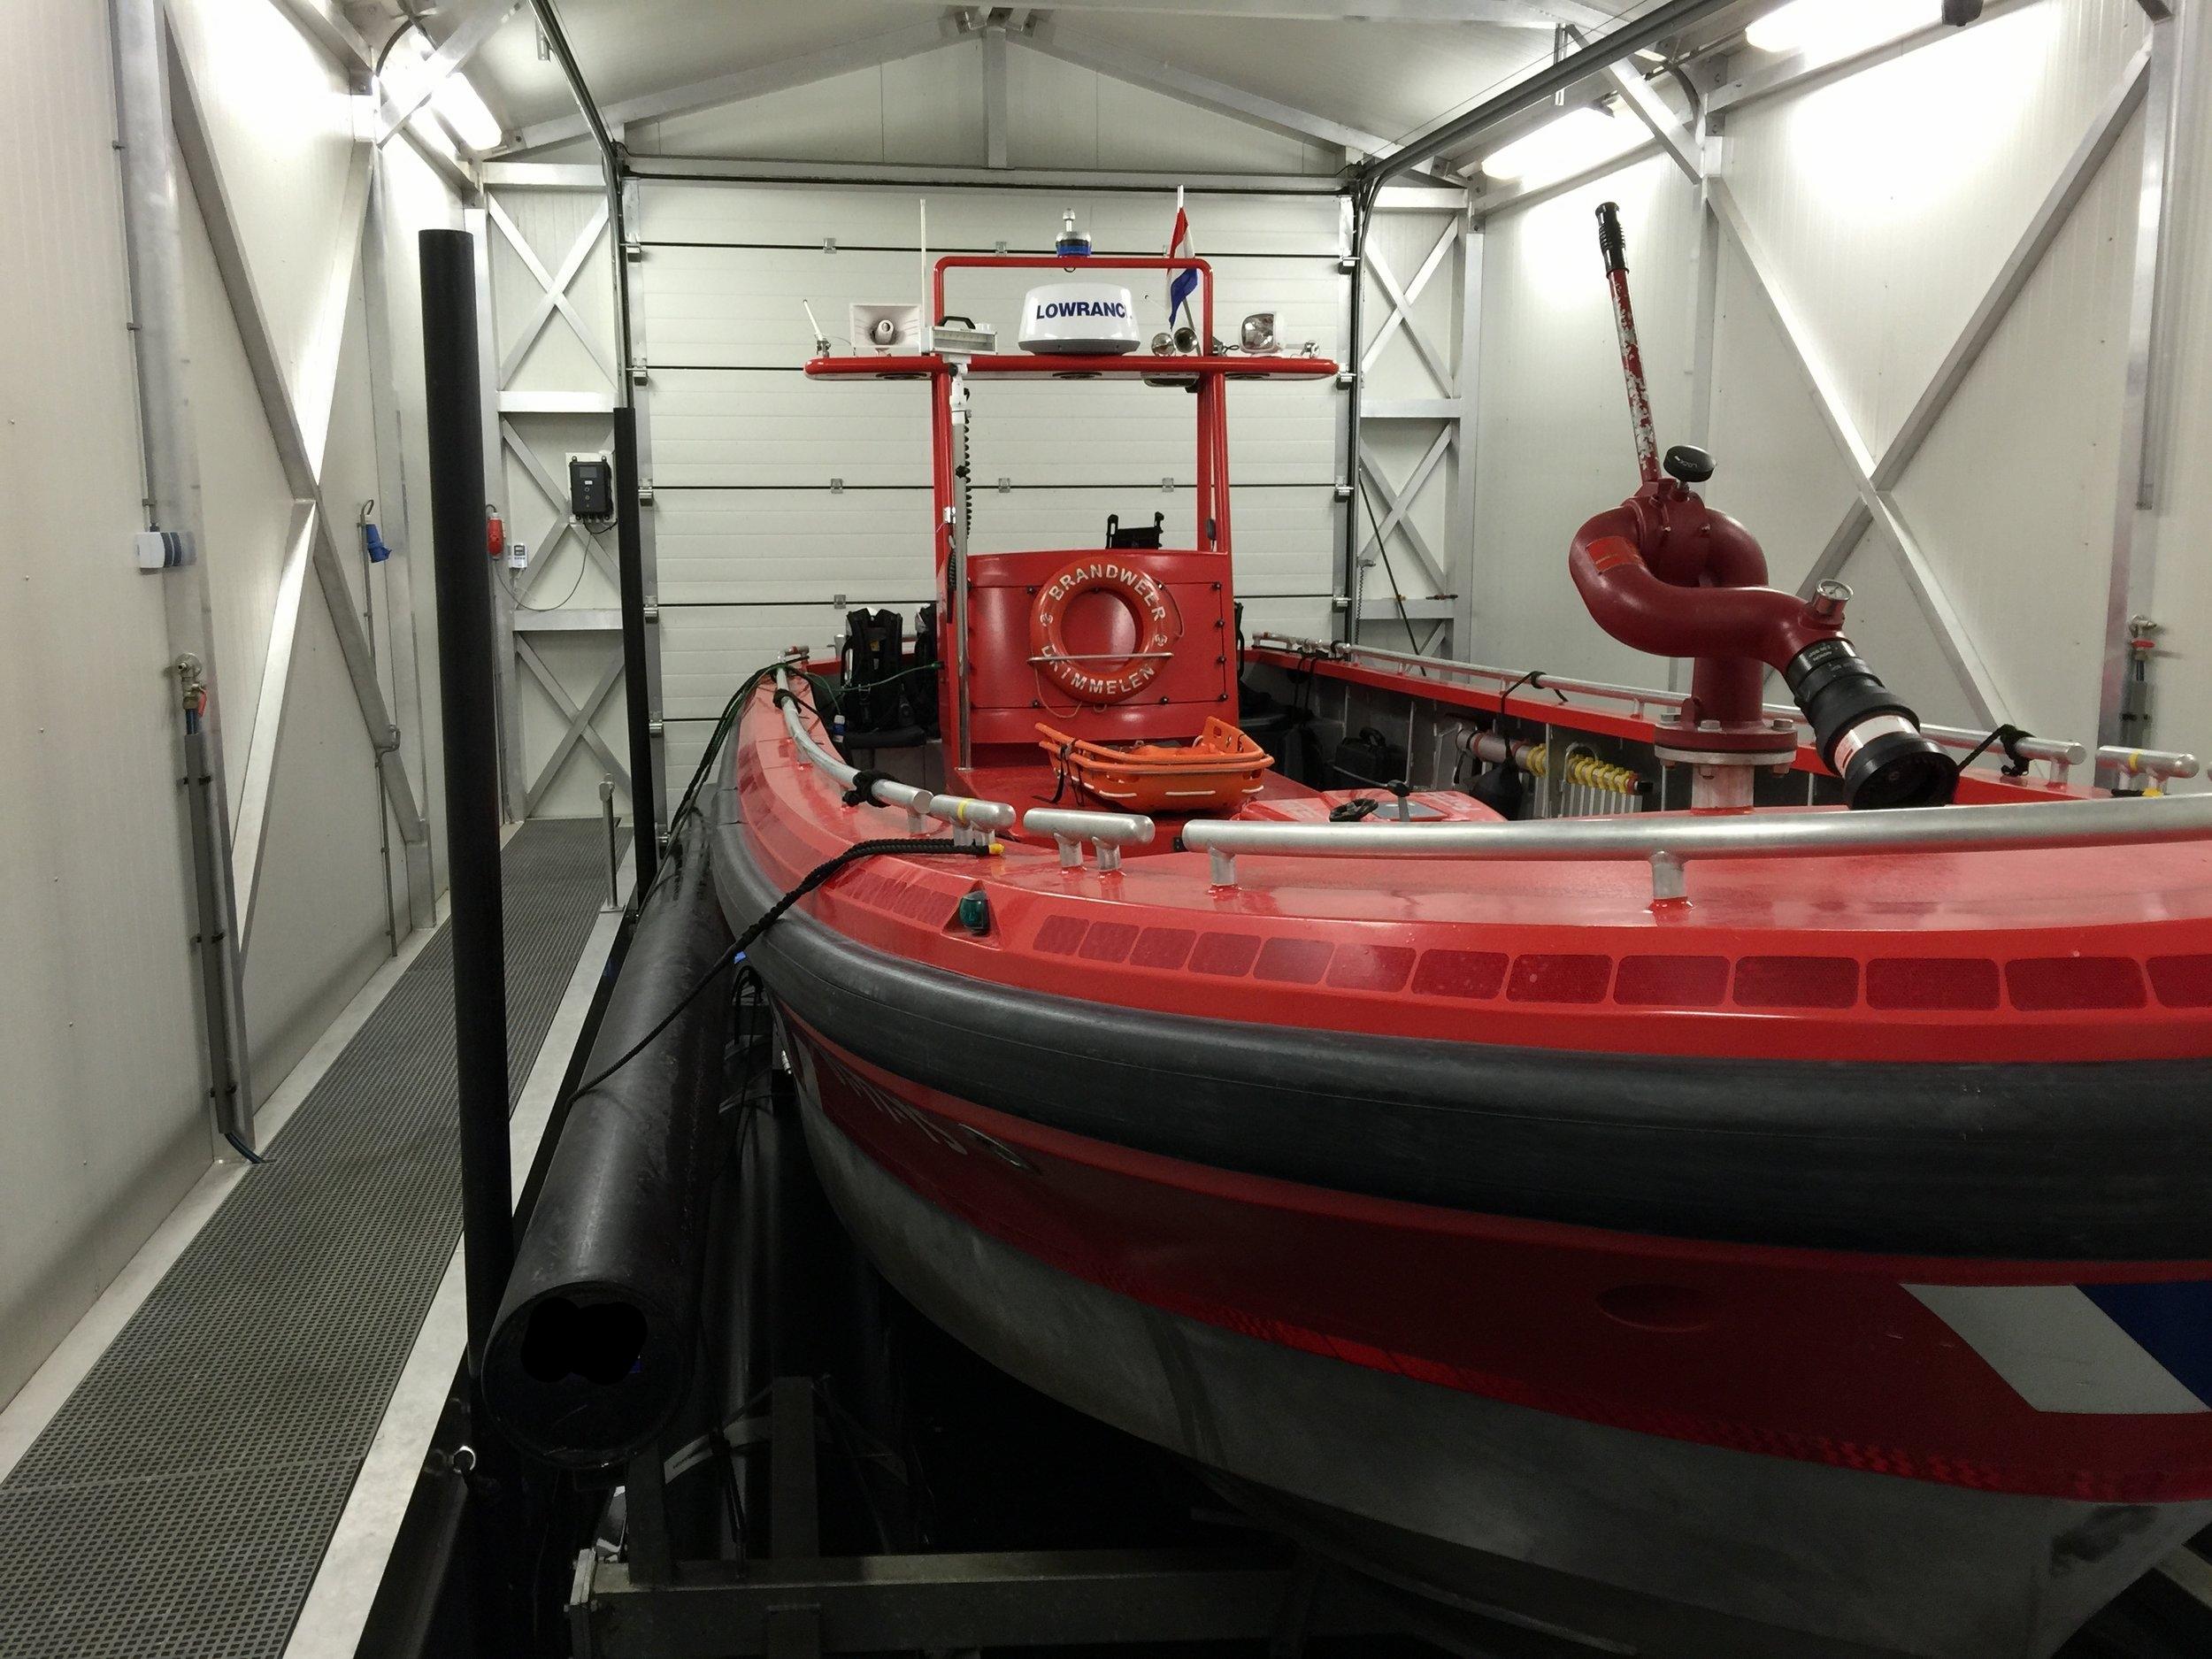 Copy of Boatlift, Drijvende boatlift, schwimmende bootslift, drijvende bootlift, floating boatlift, bootlift, boot lift, boatlifting systems, bootslift, schiffshebewerk,